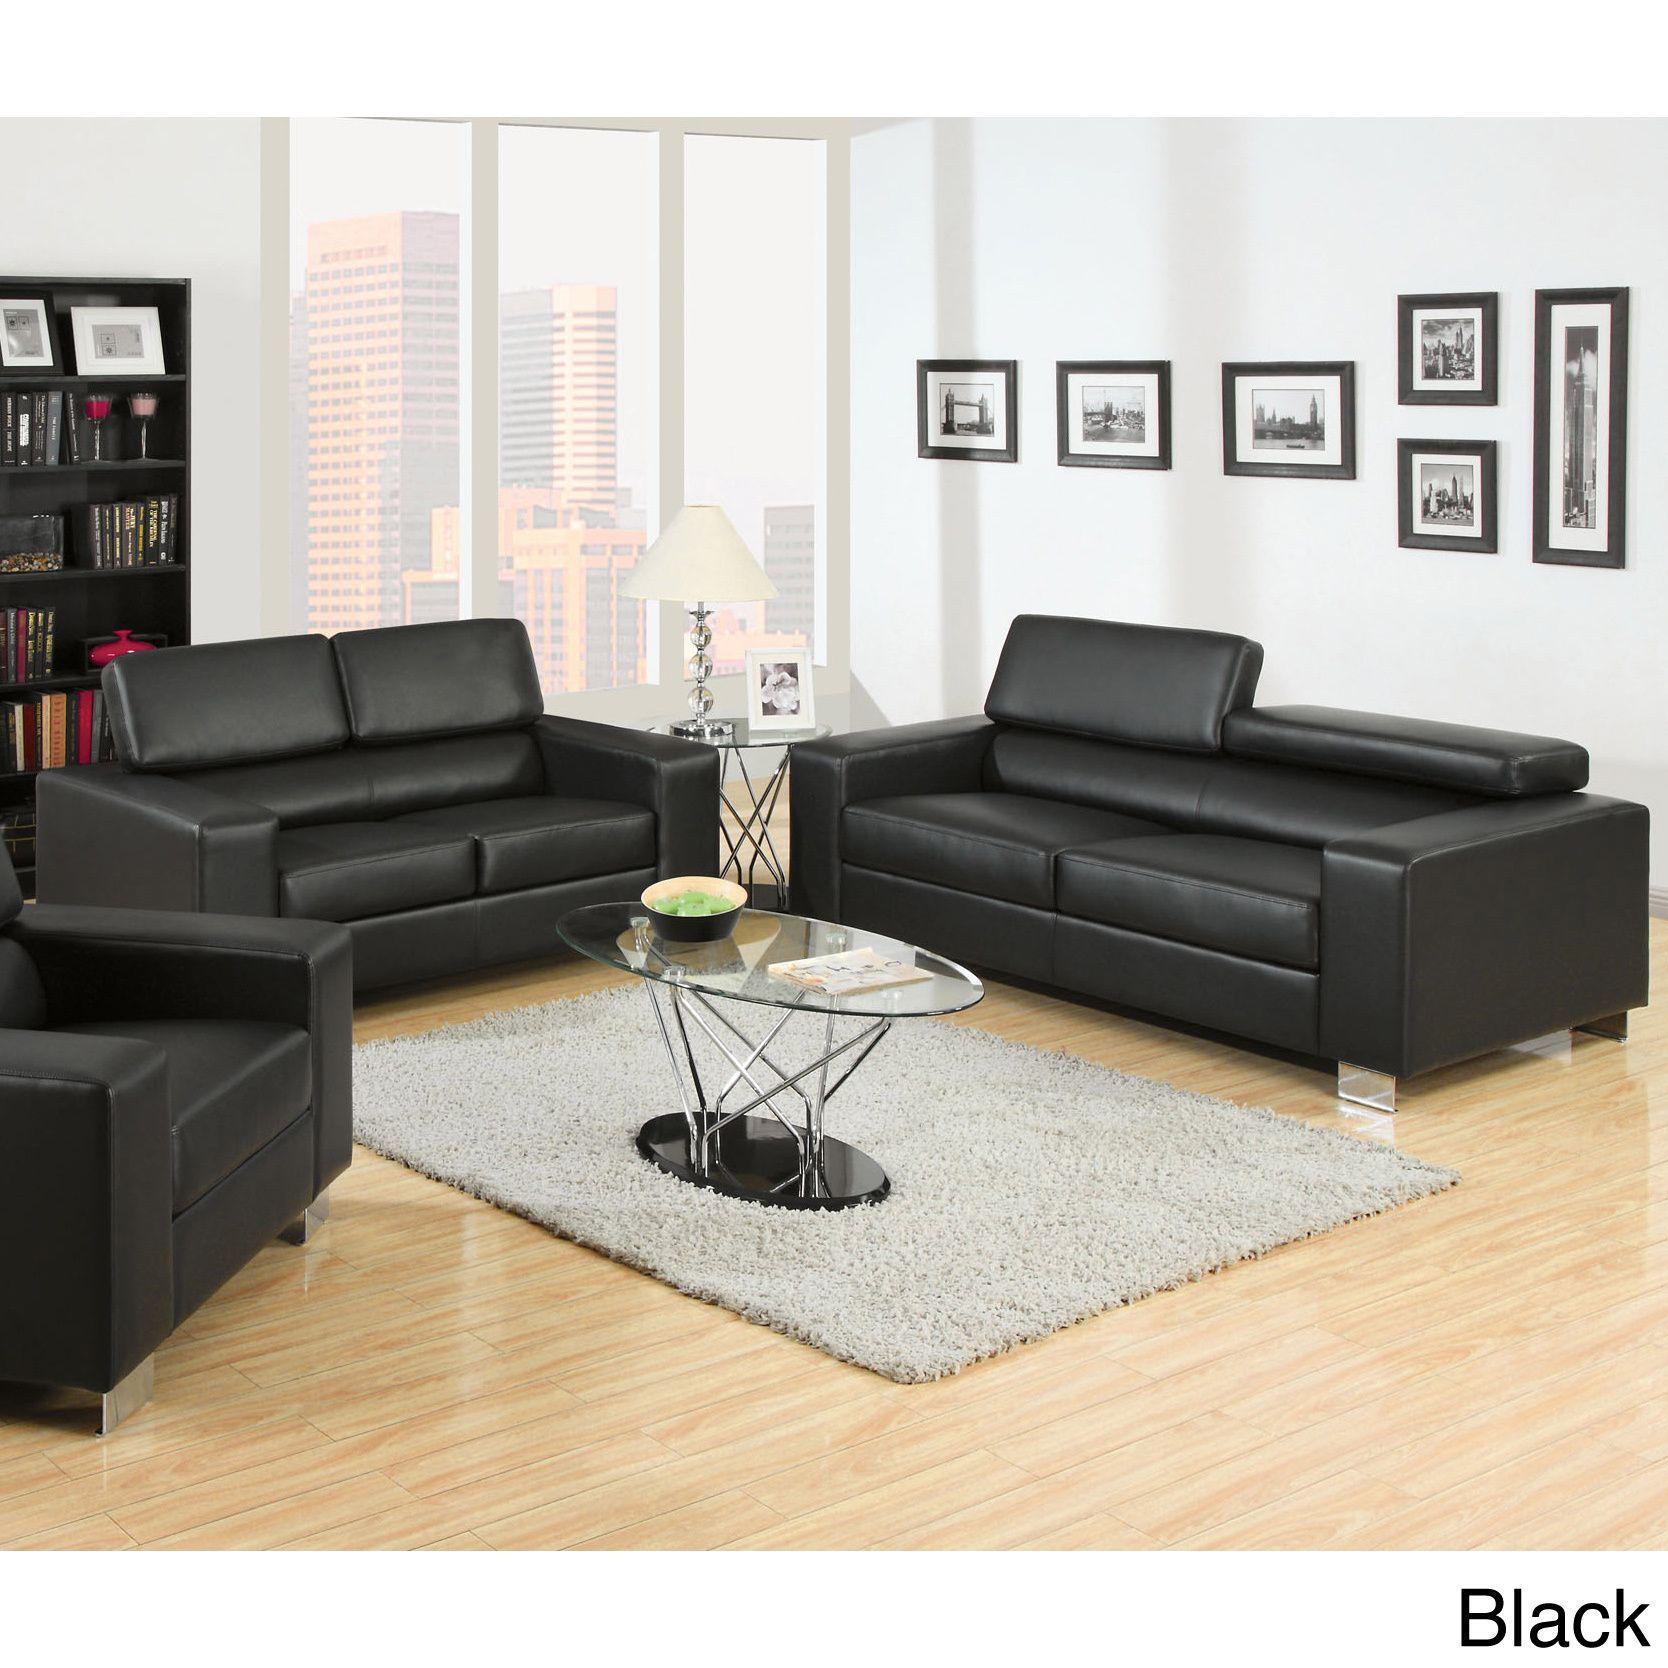 Furniture of America Mazri 2 Piece Bonded Leather Sofa and